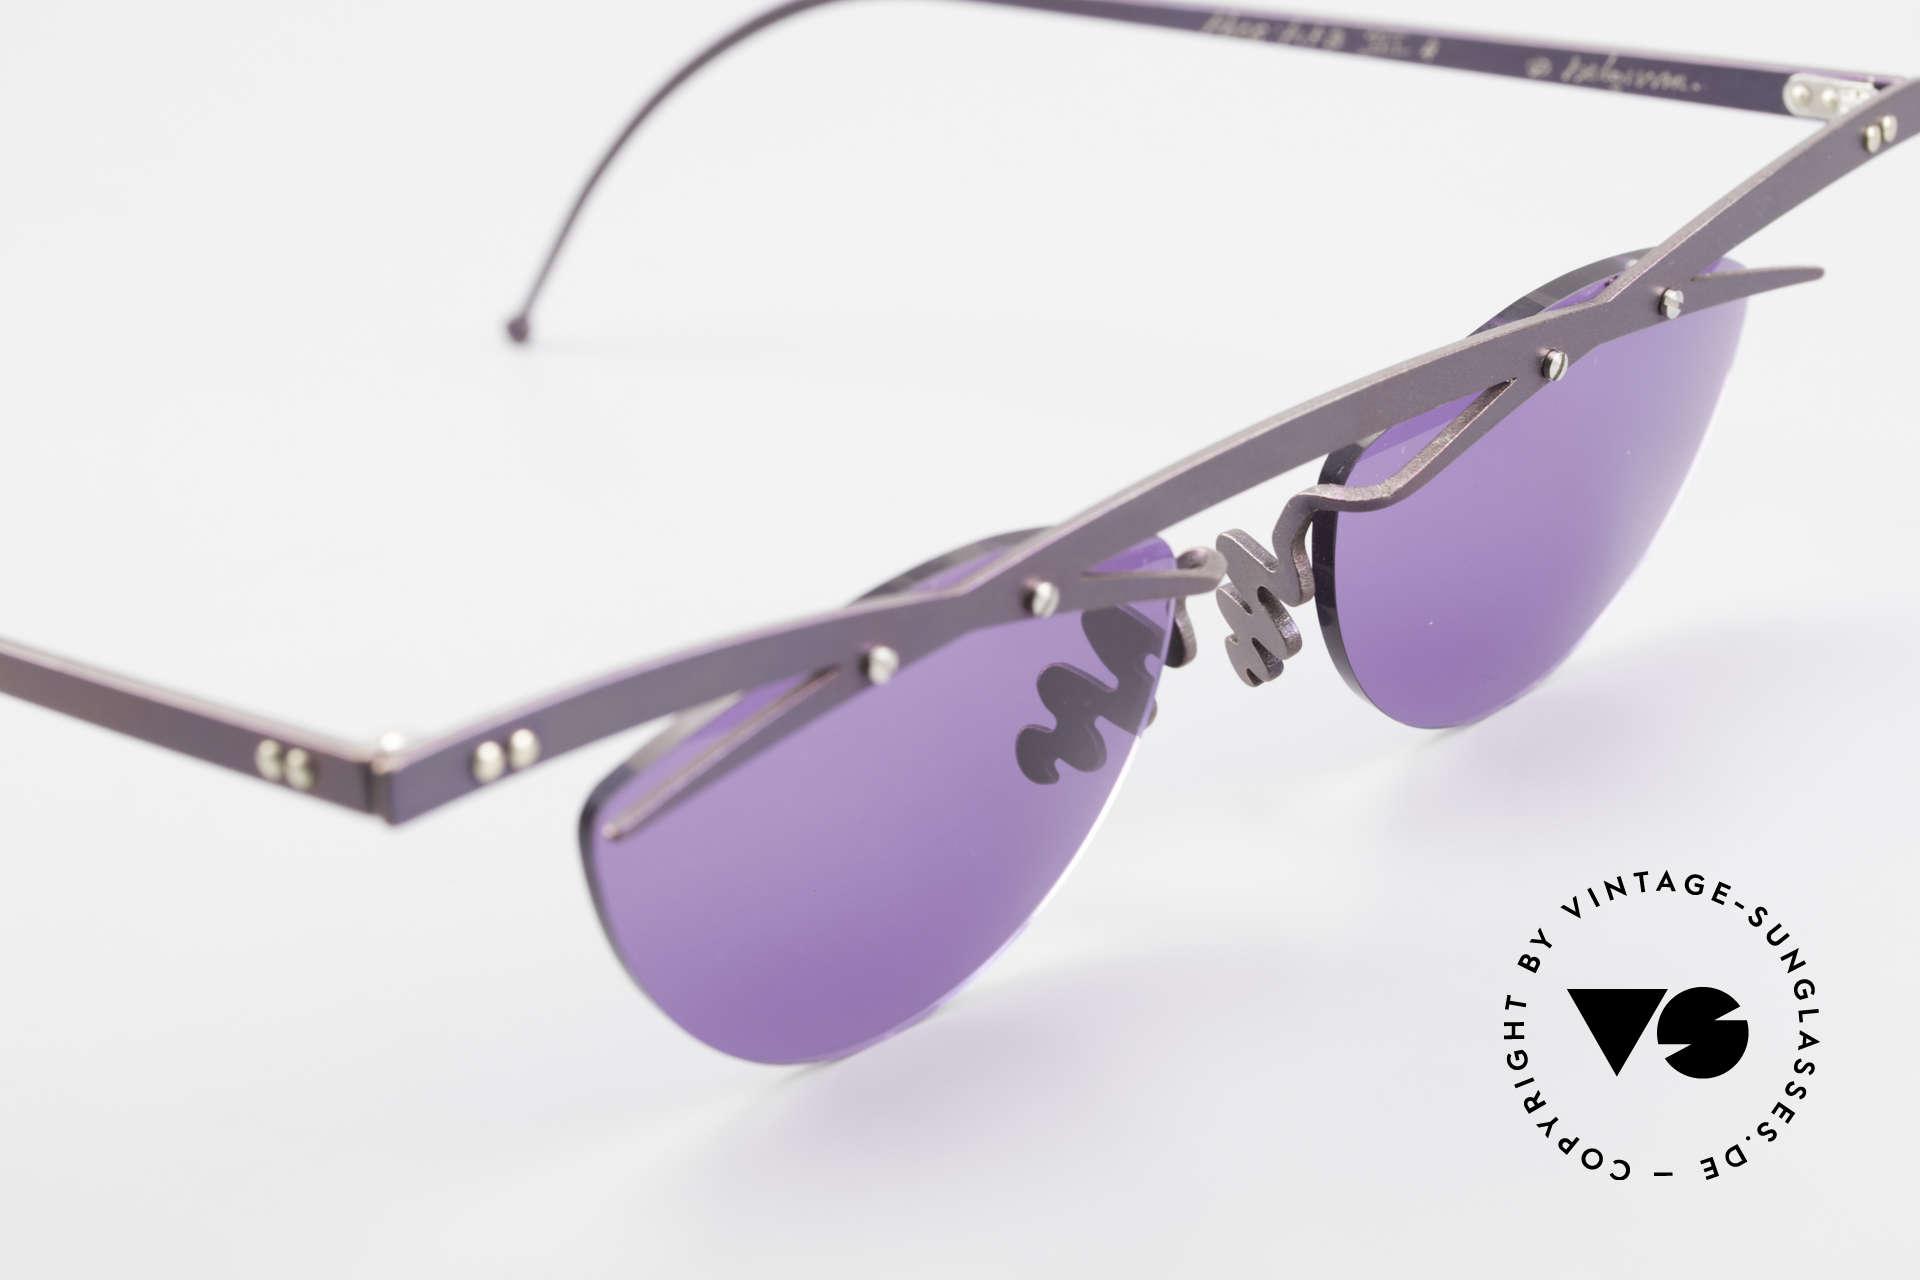 Theo Belgium Tita III 4 XL Crazy Vintage Sunglasses, an old, unworn THEO original and NO RETRO EYEWEAR, Made for Men and Women